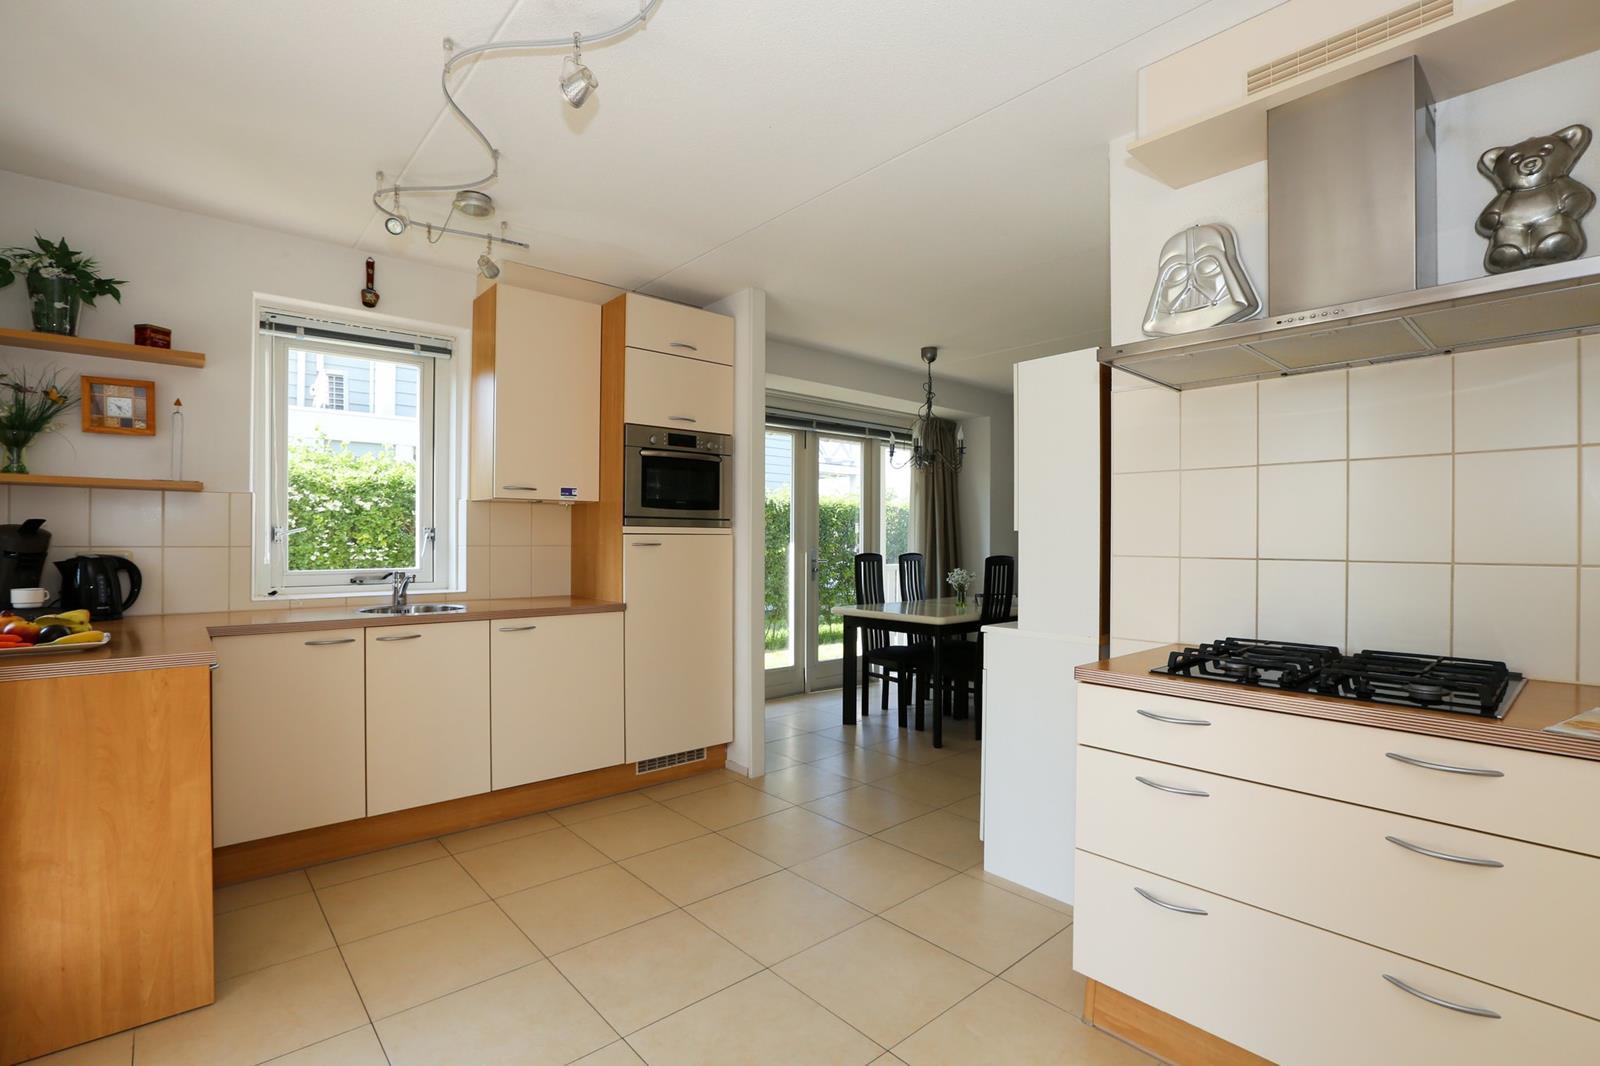 Vakantiehuis te koop aan water in Zuid-Holland 029.jpg